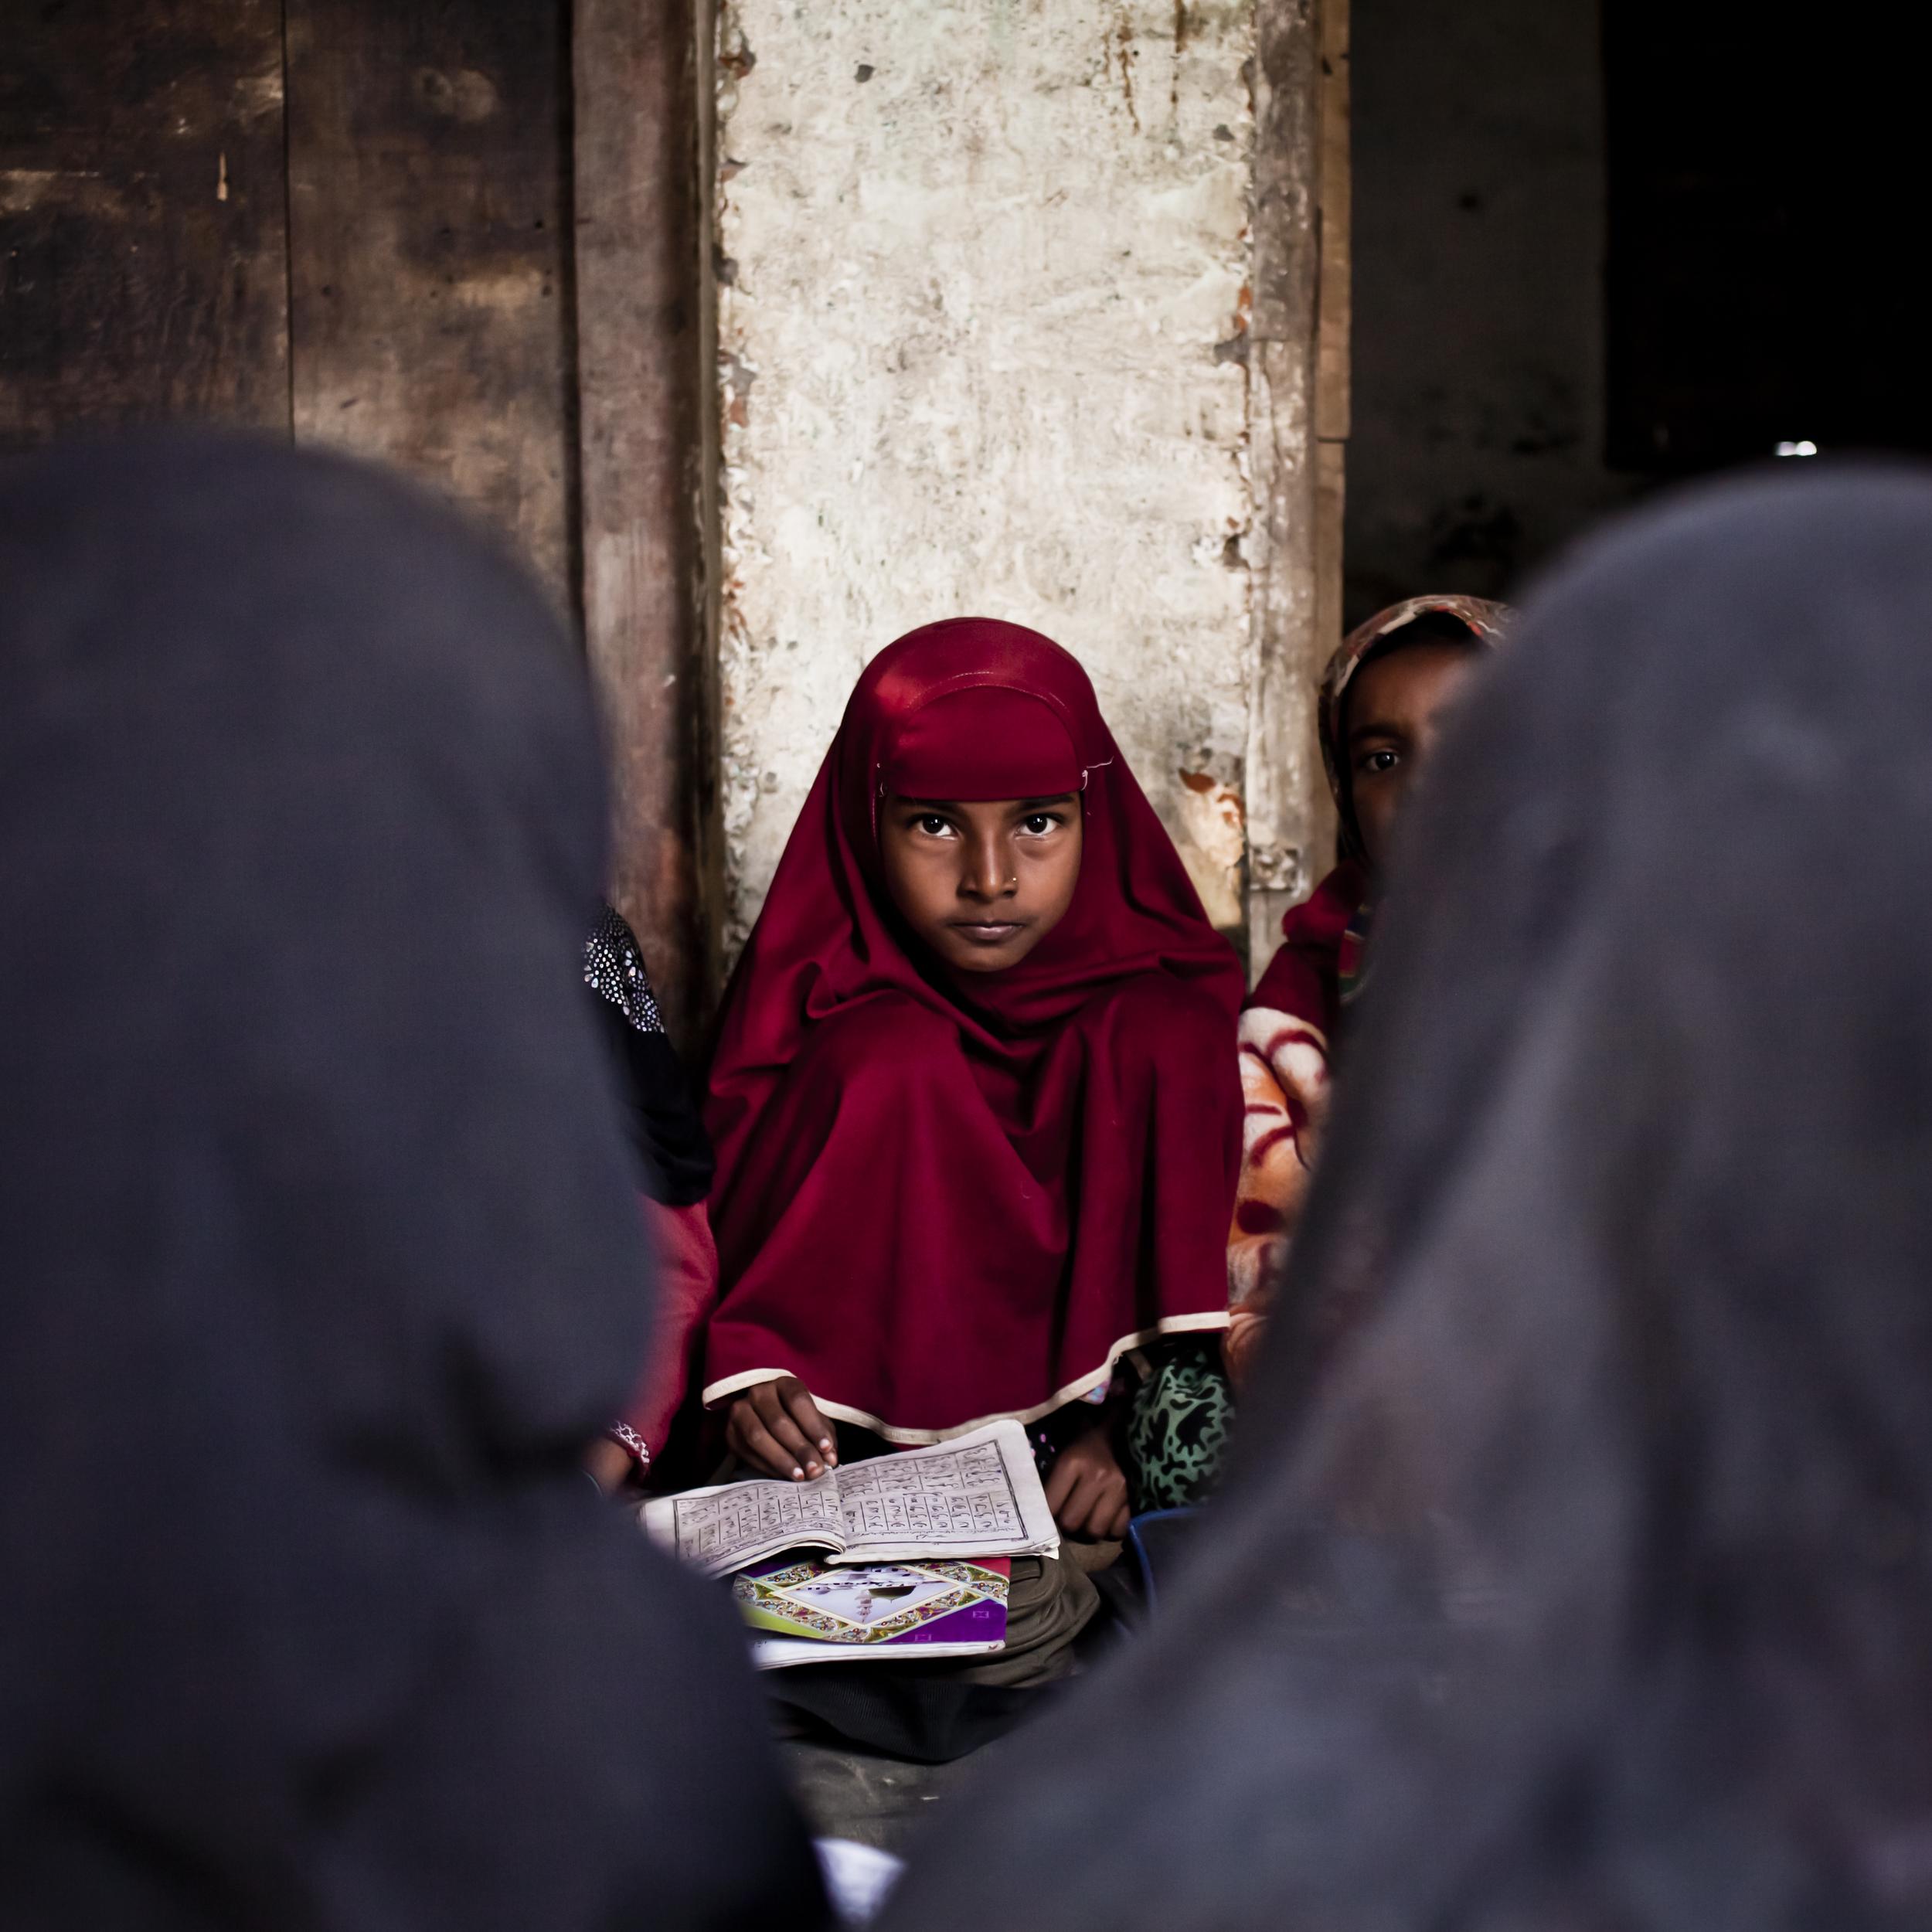 20131204-untitled-5656-Alice Carfrae-child labour-Nepal.jpg